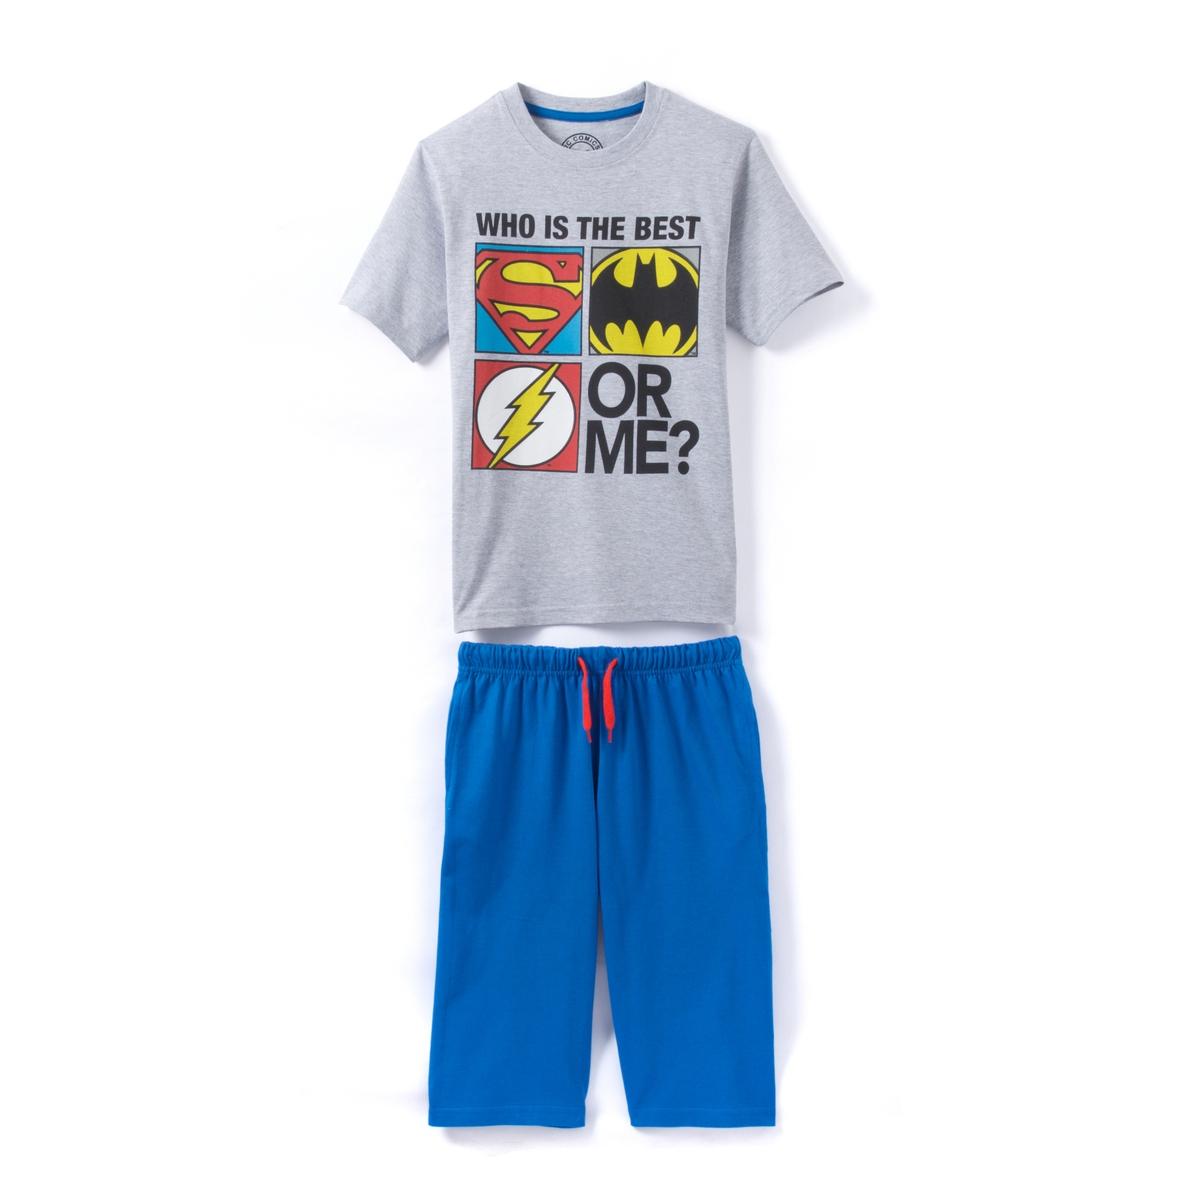 Пижама с короткими рукавами с шортами  4 - 12 лет  DC Comics